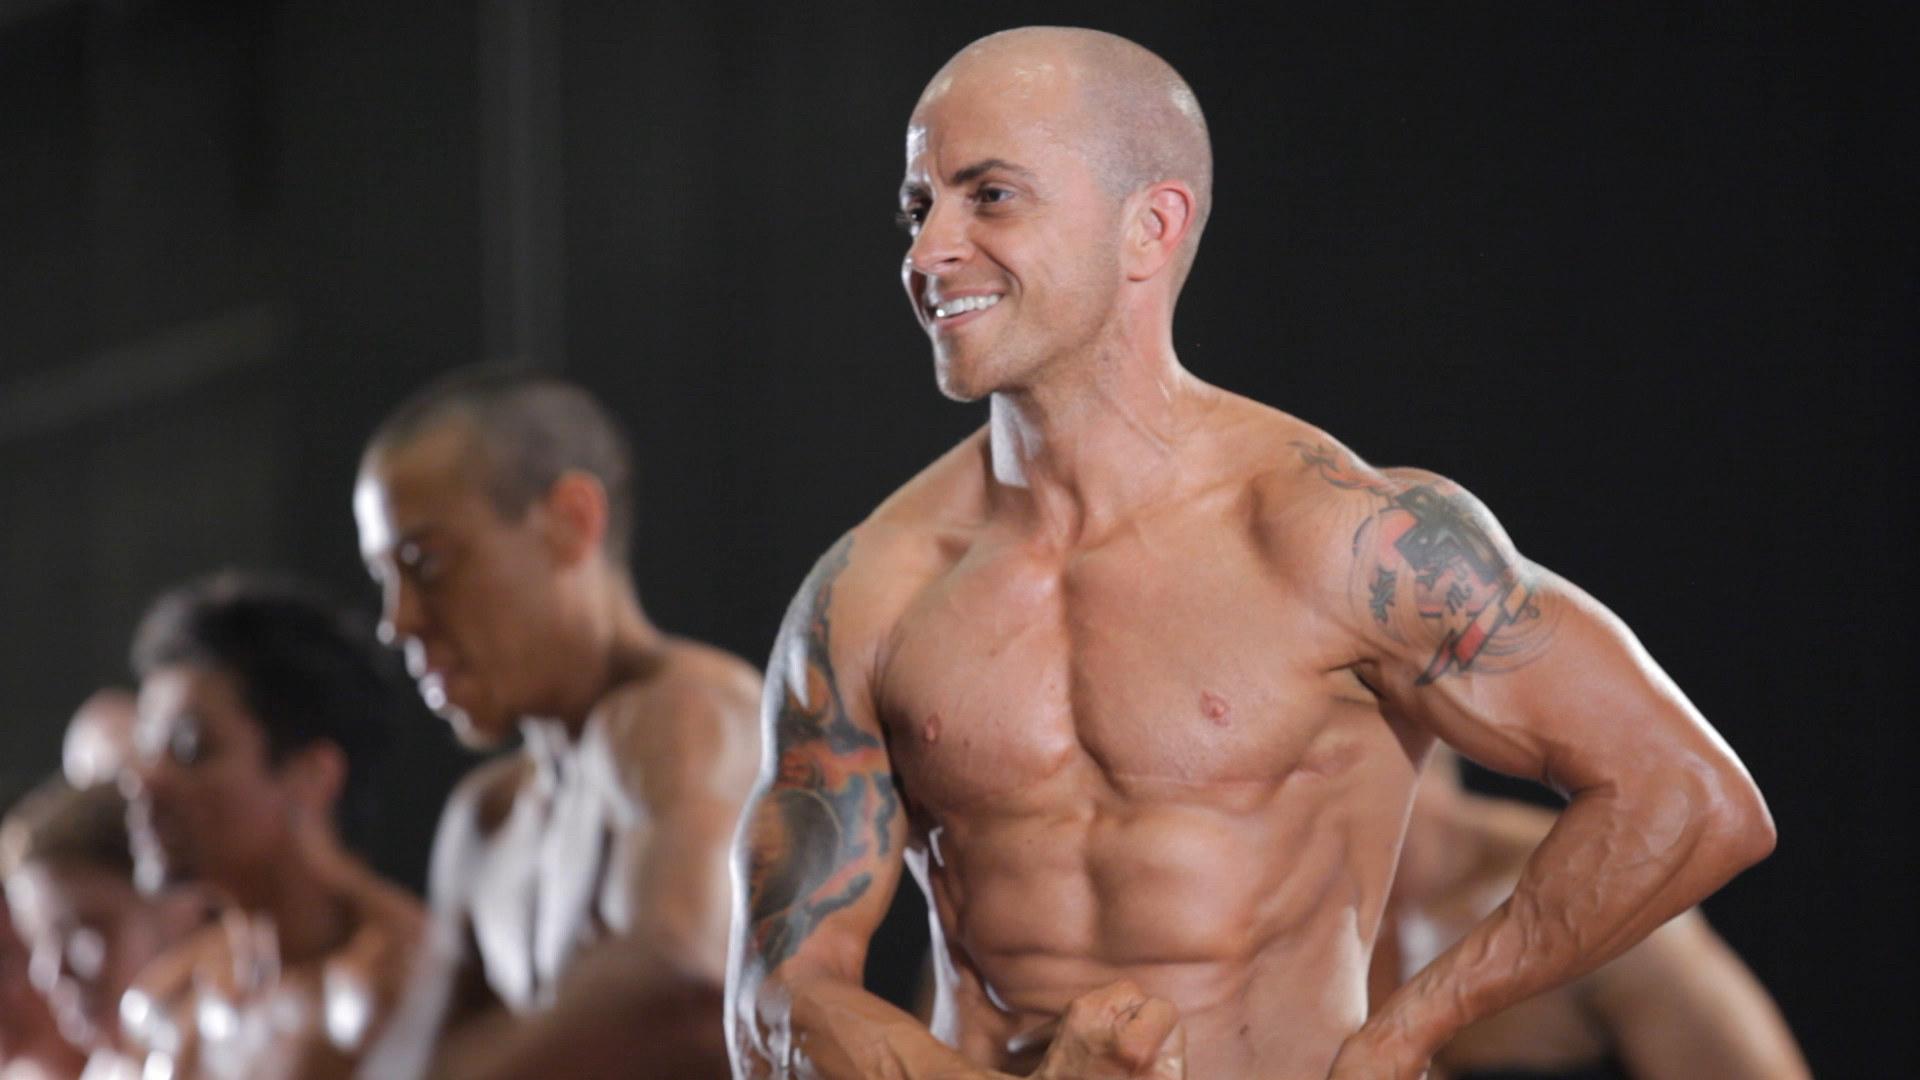 A trans bodybuilder strikes a pose